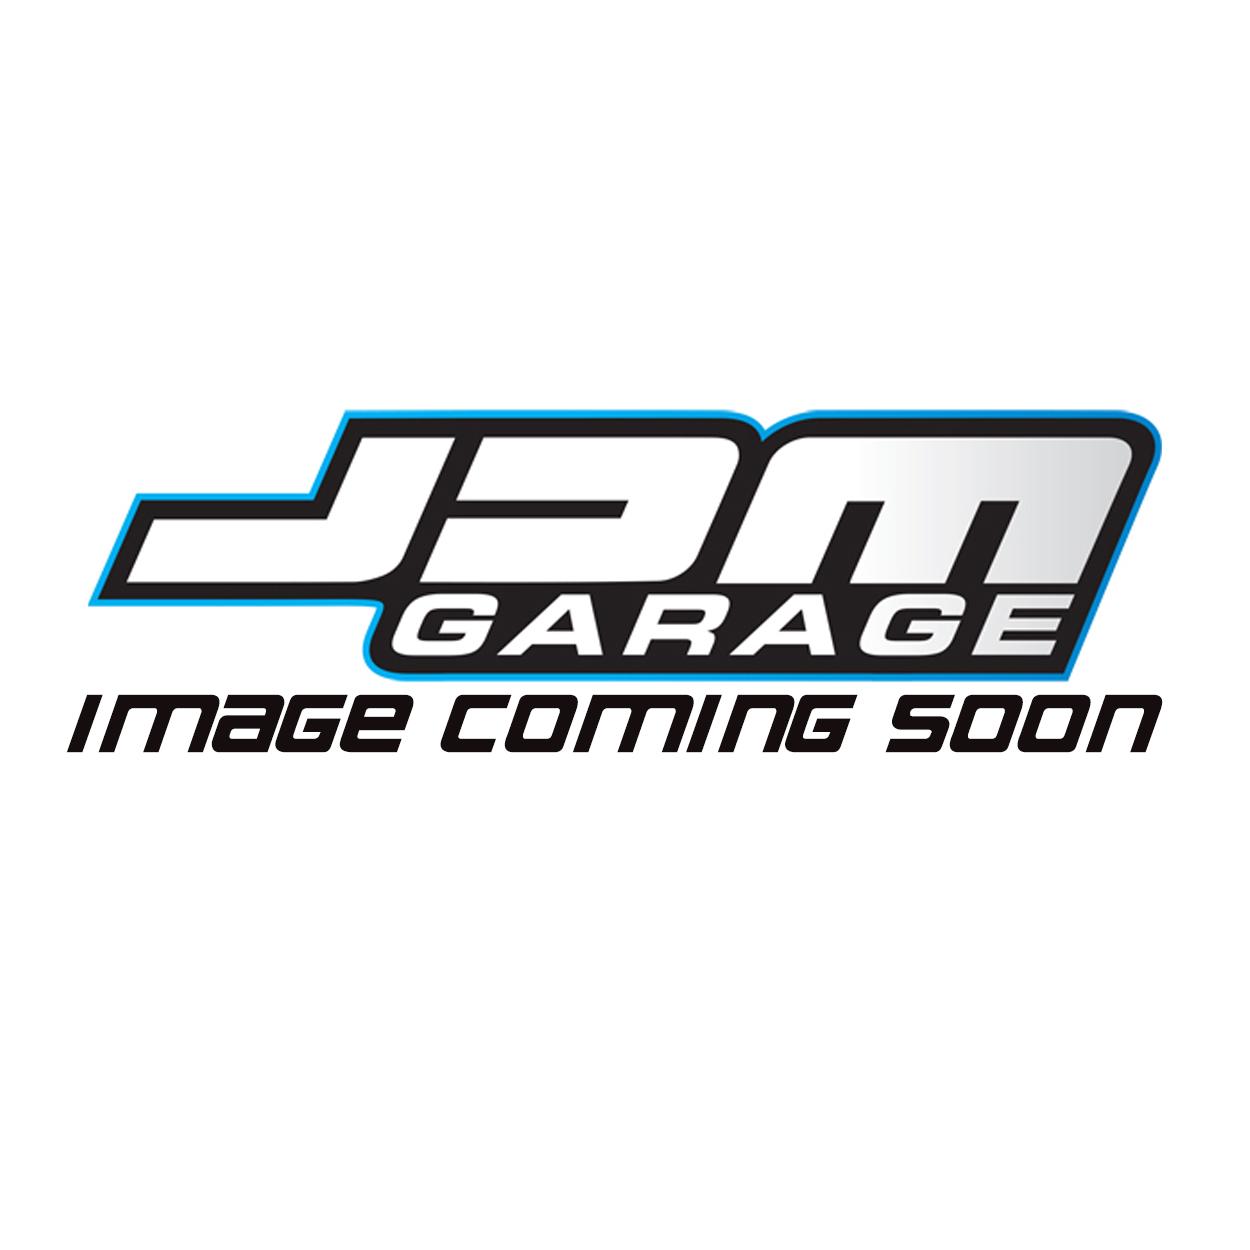 JDM Garage Original Pull-On Beanie - Black